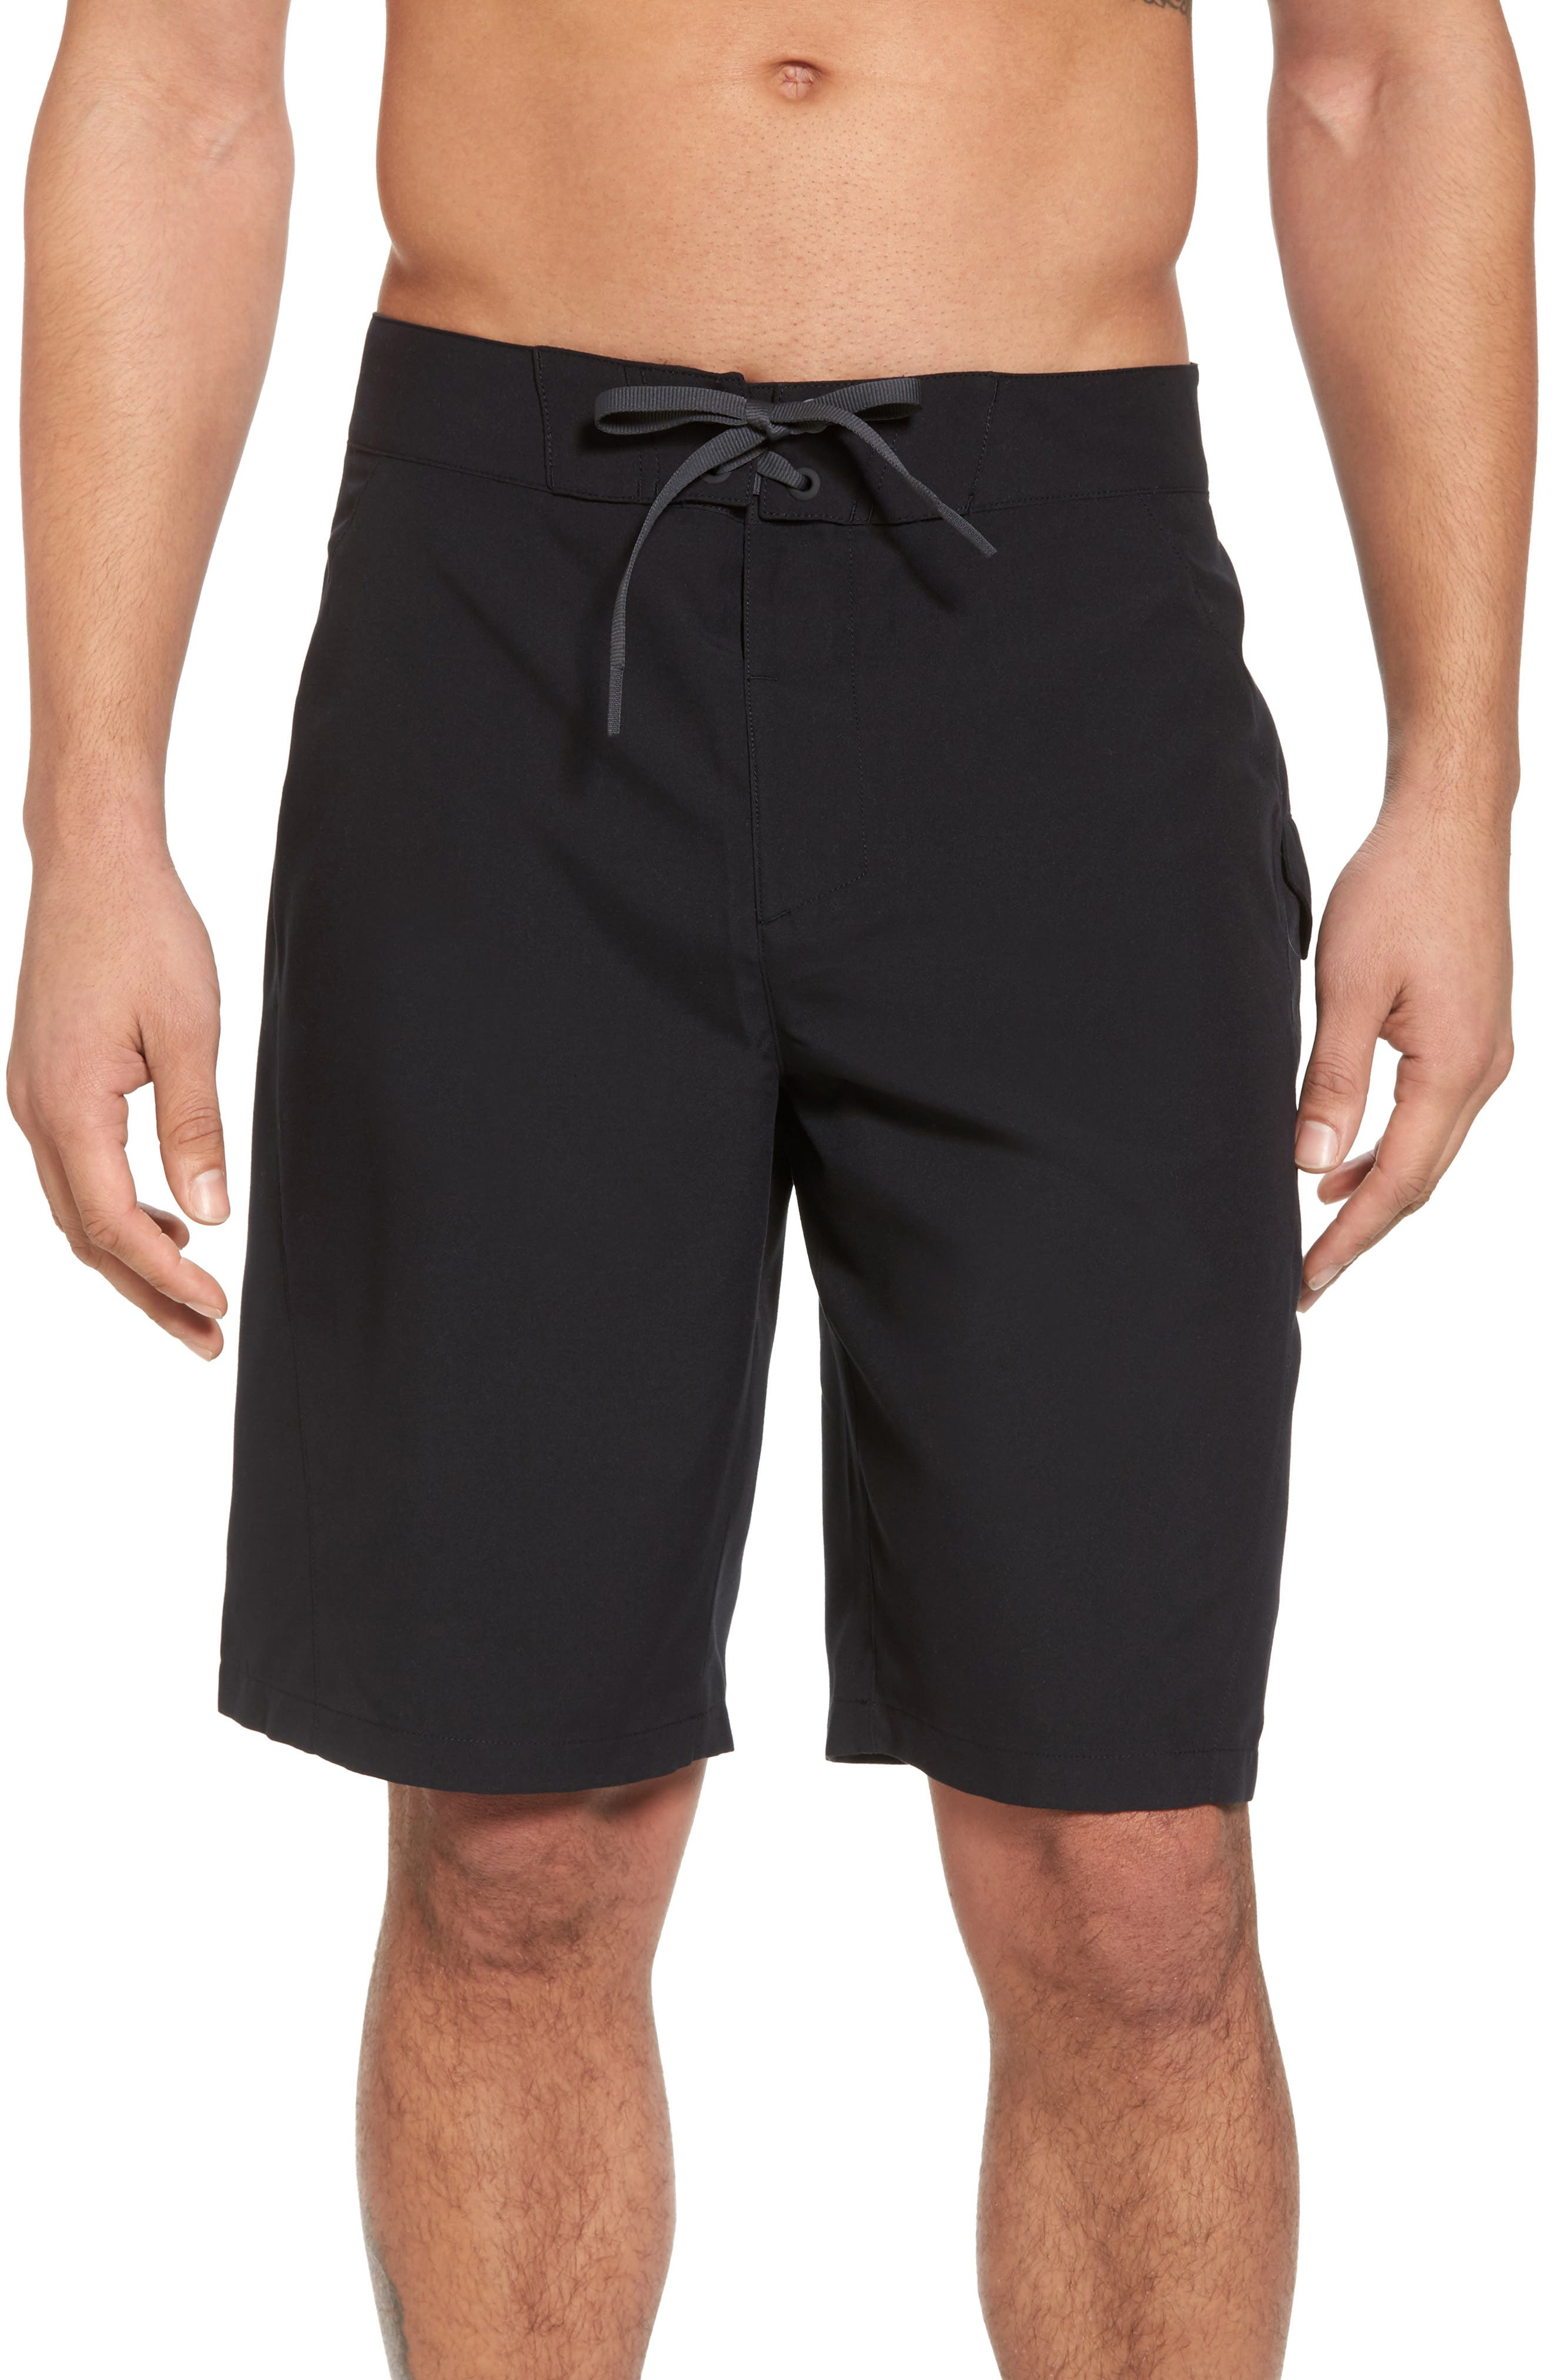 Mania Tidal Board Shorts,                         Main,                         color, 001